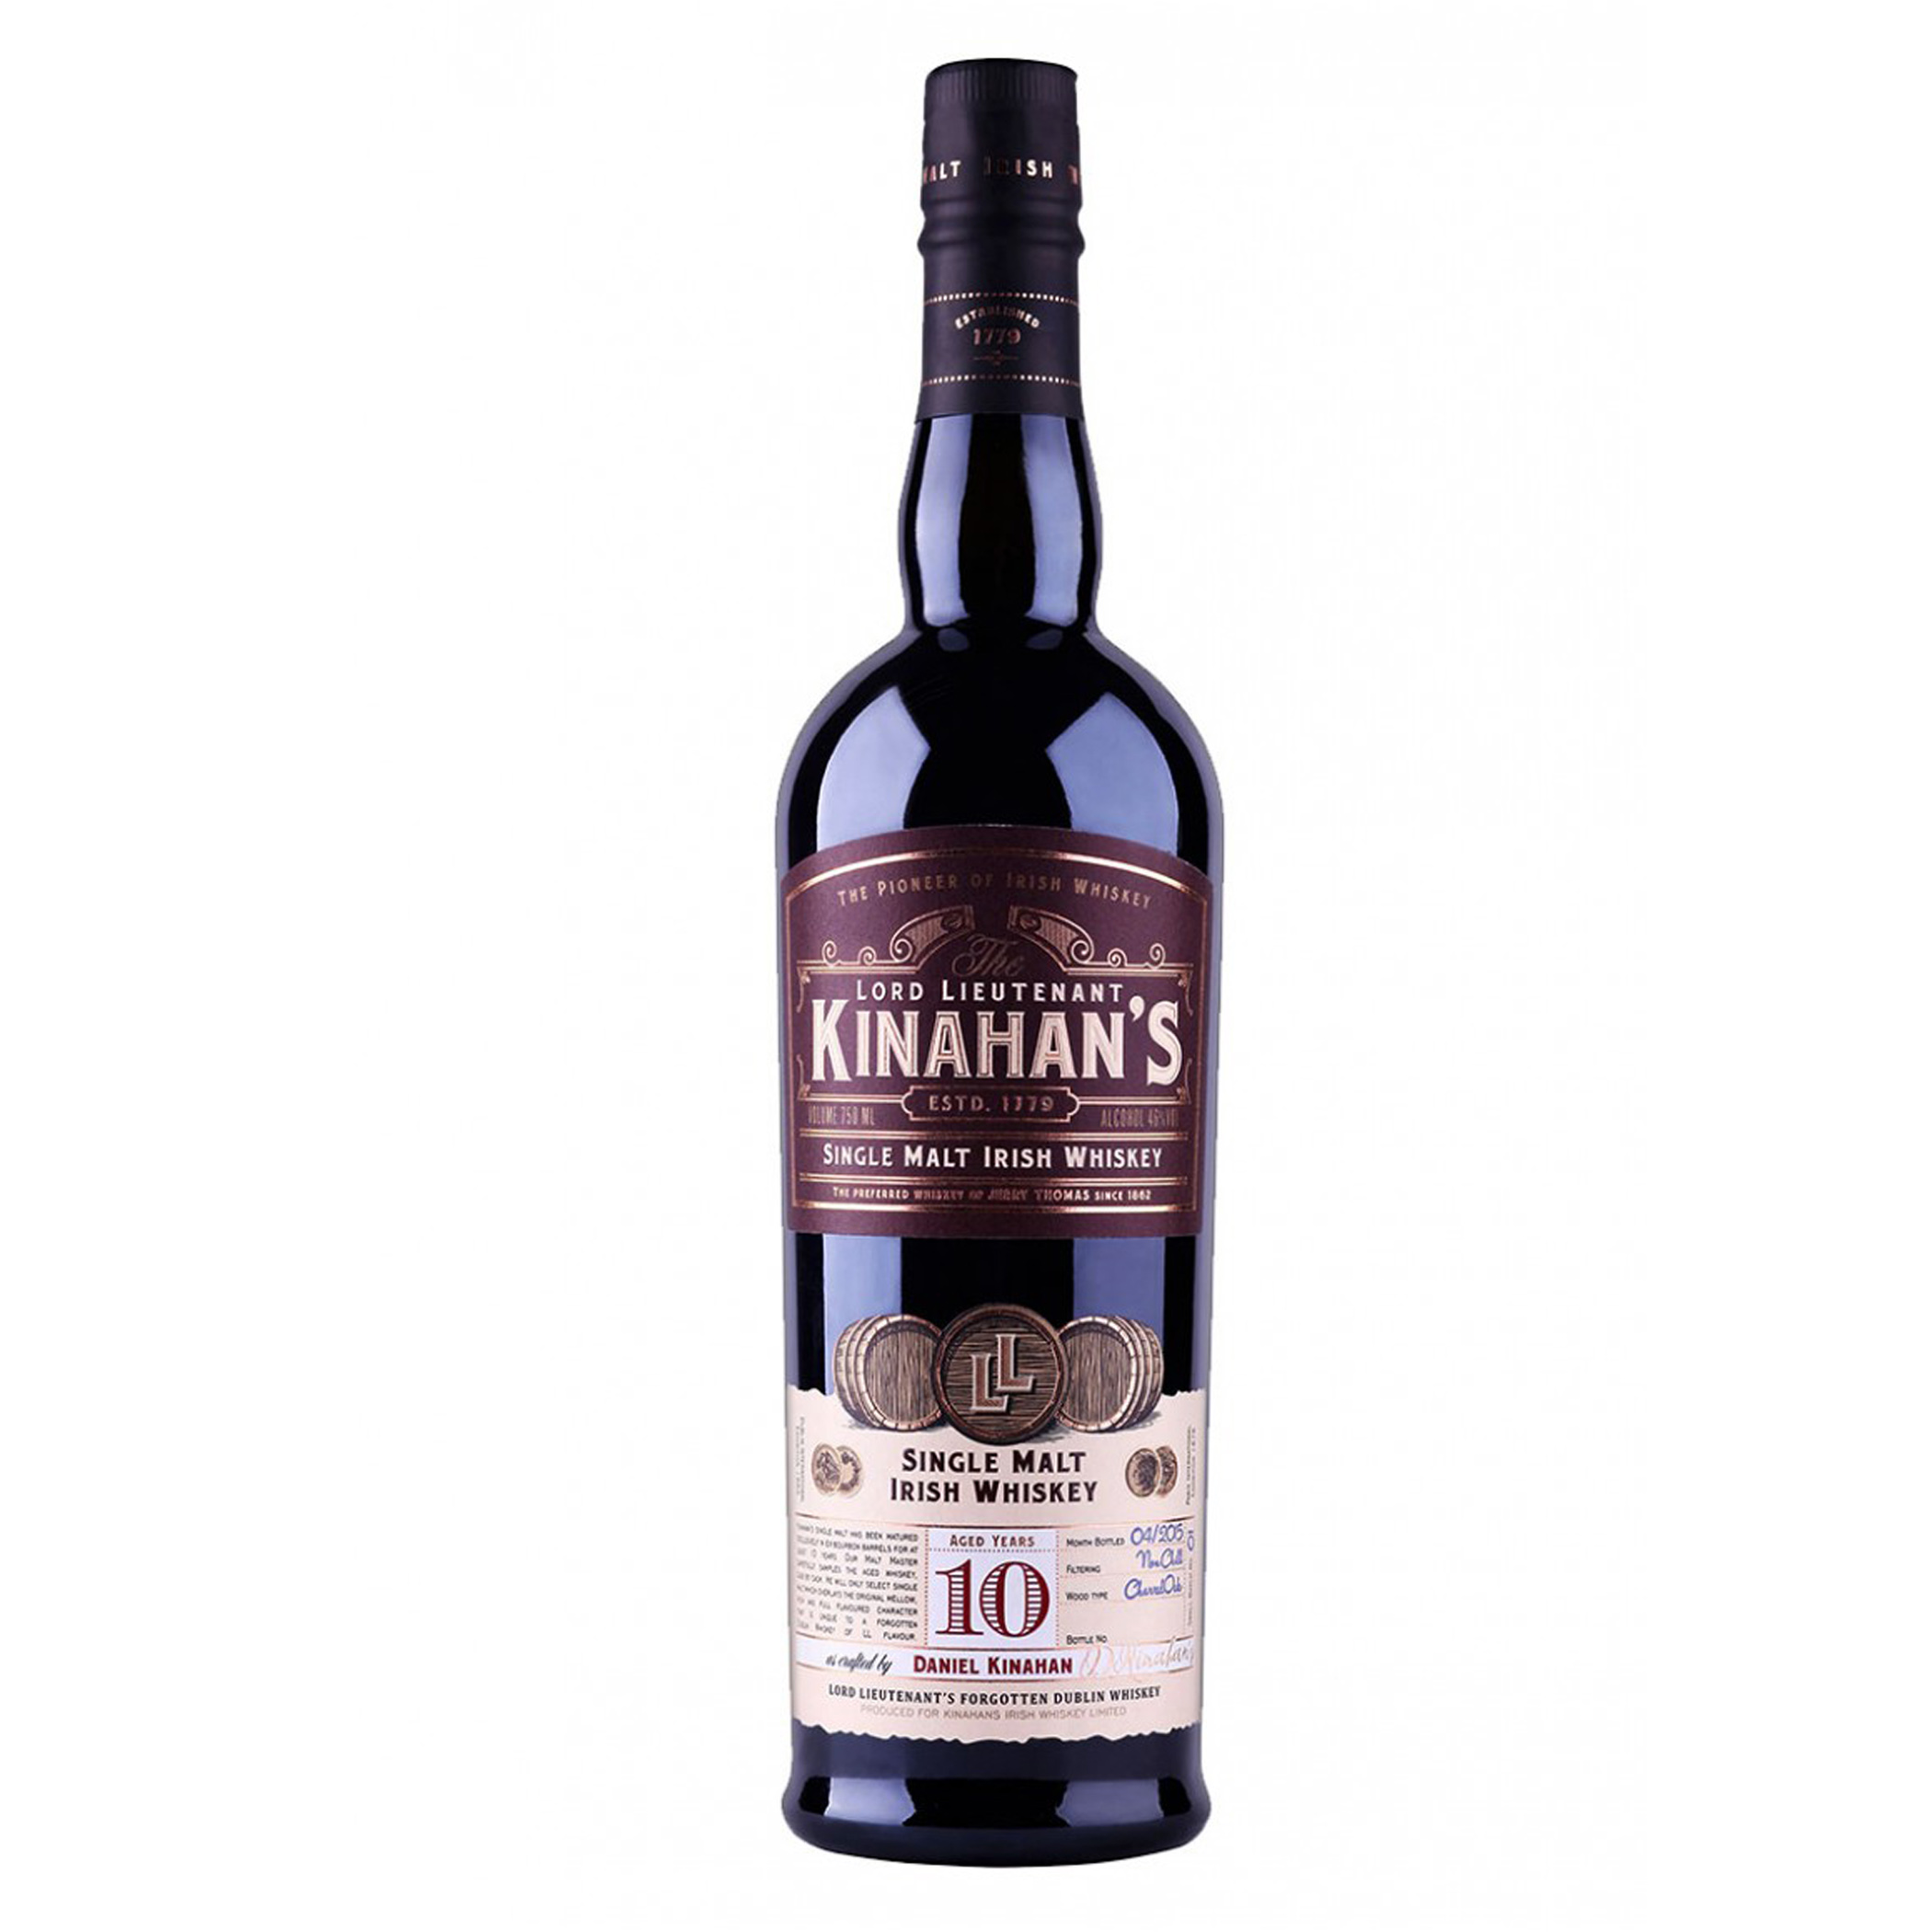 Kinahan's Single Malt 10 YO Irish Whiskey